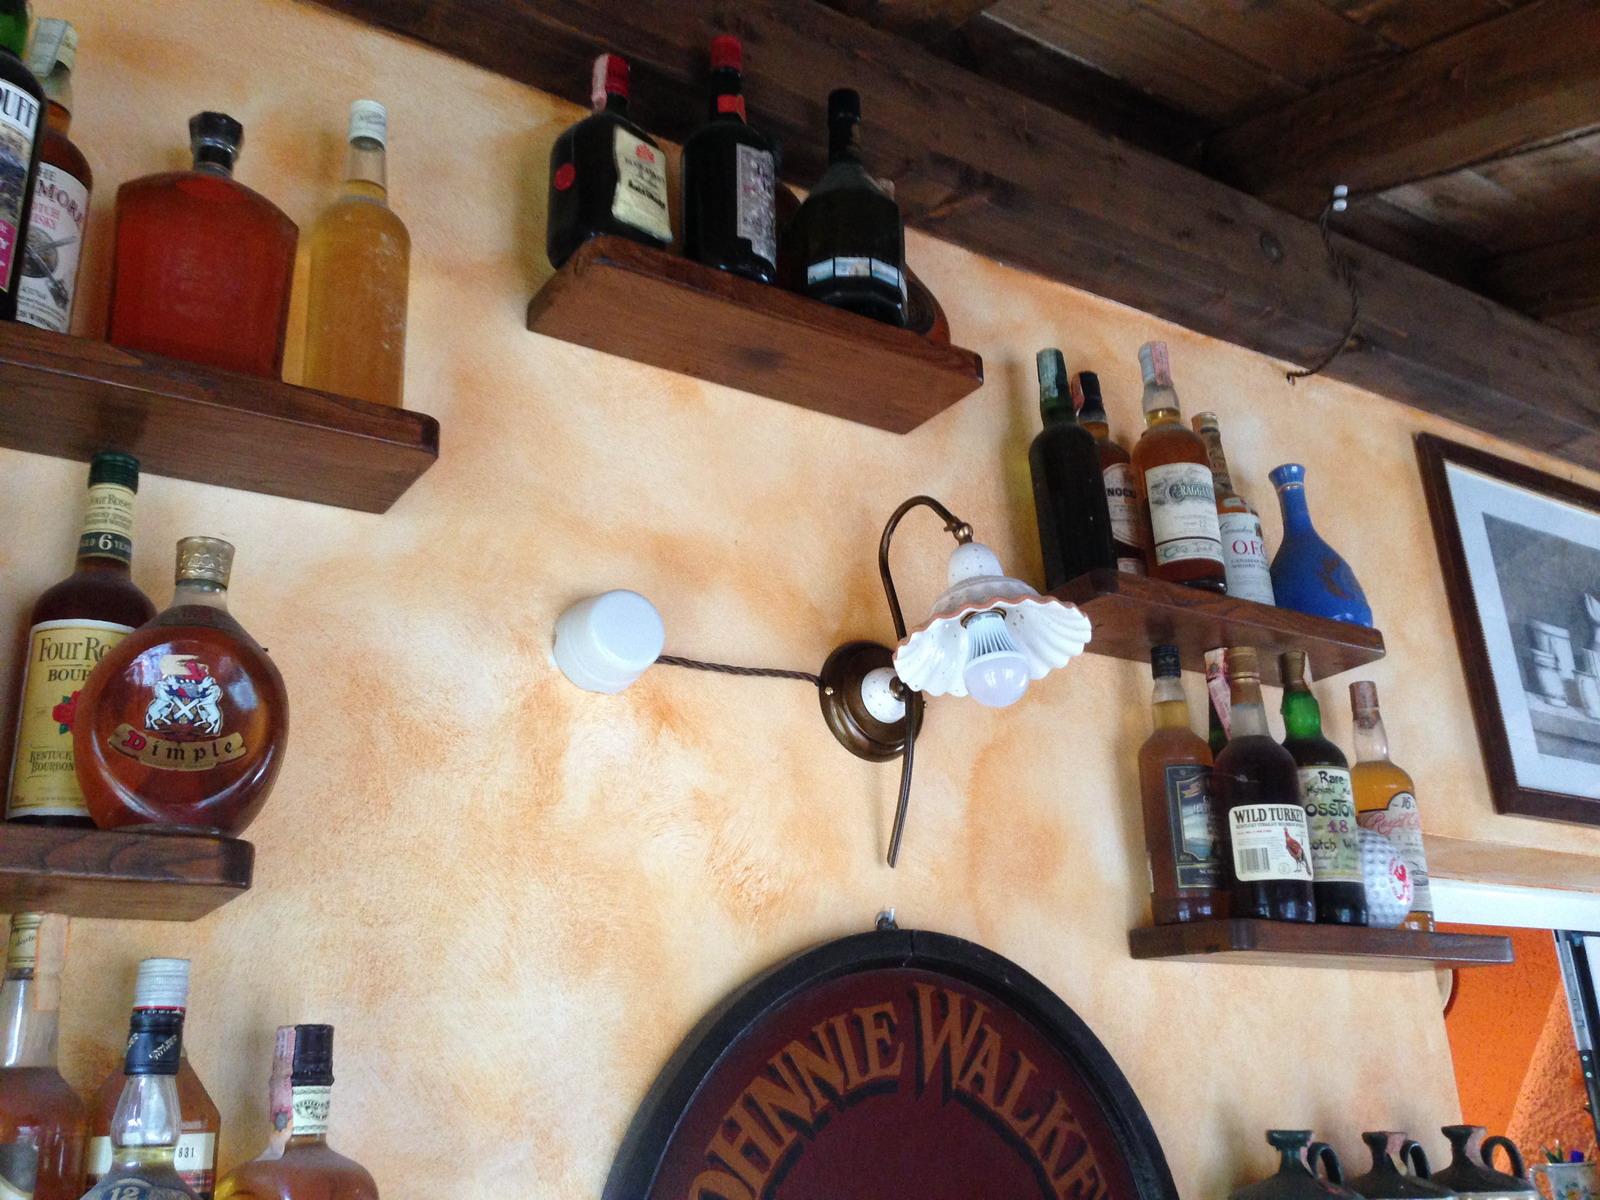 Taverna illuminazione lampadari e applique in ceramica.